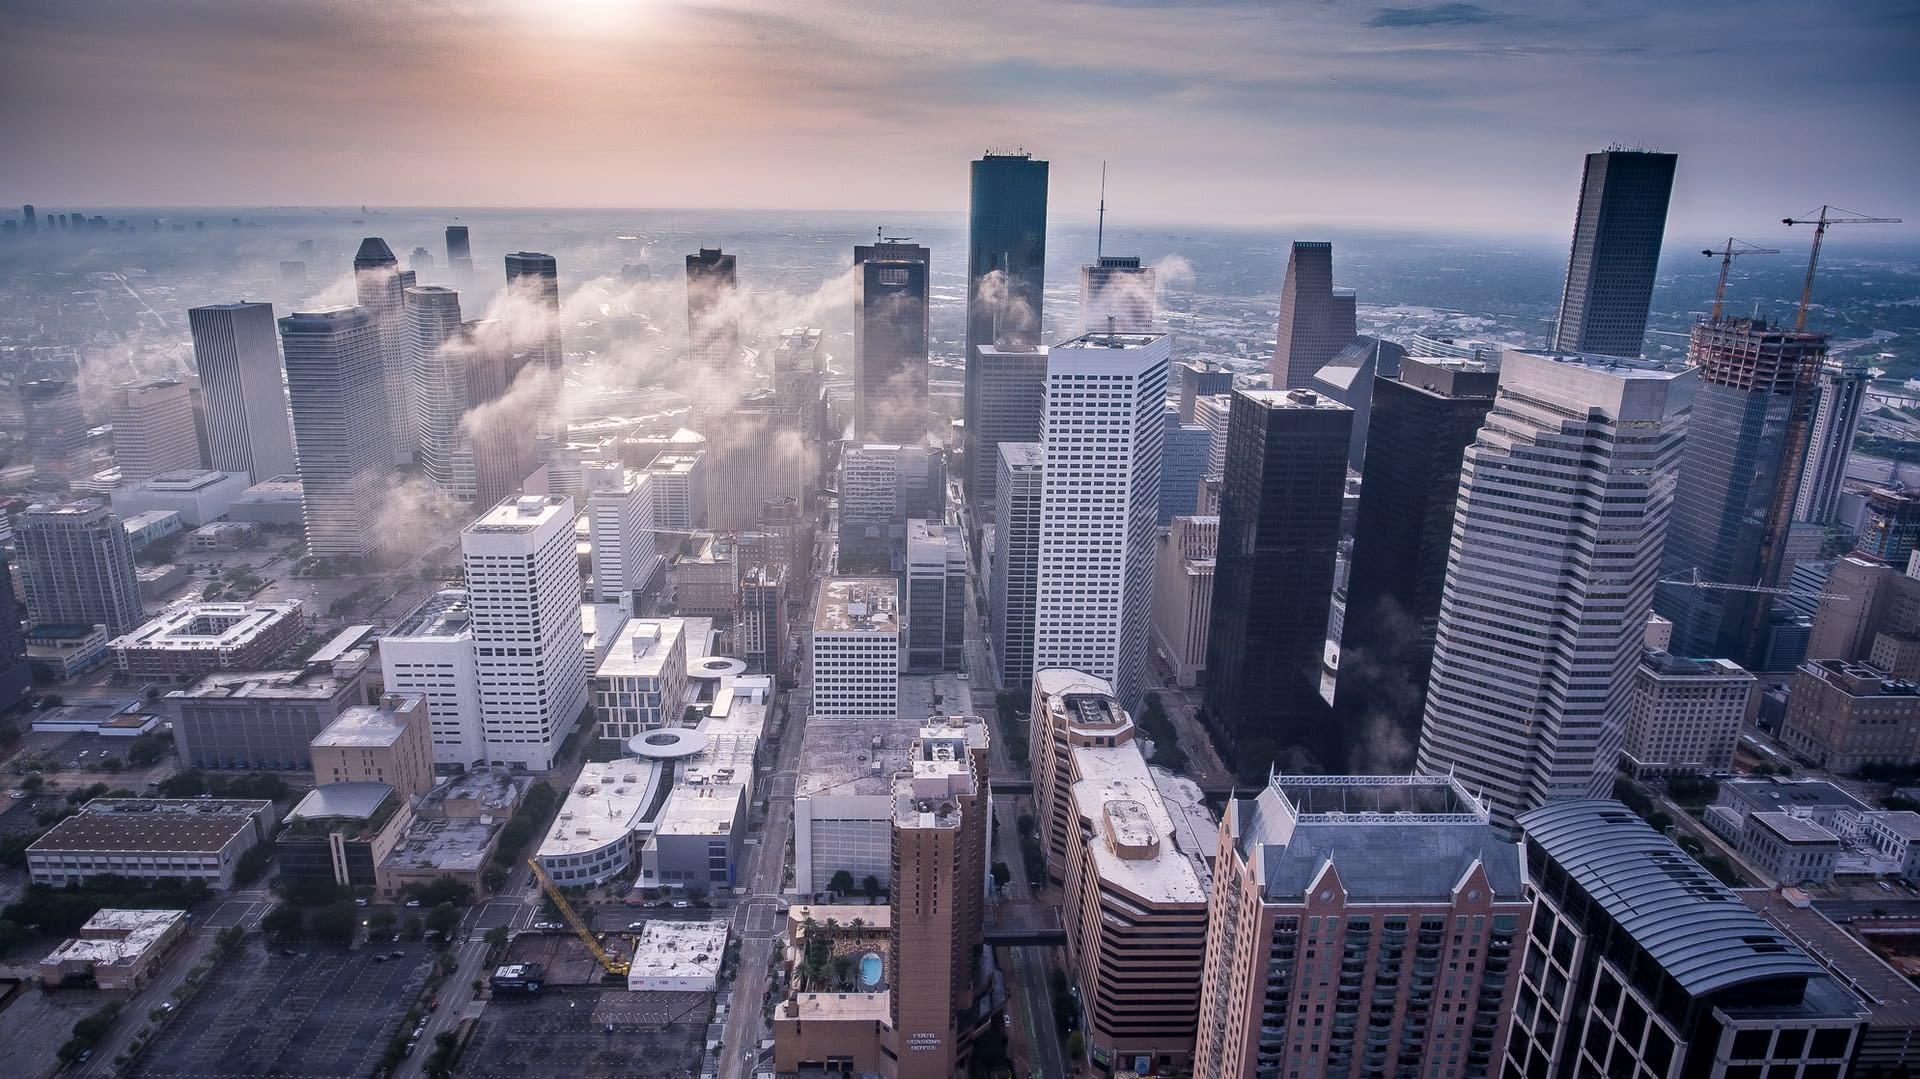 The City image